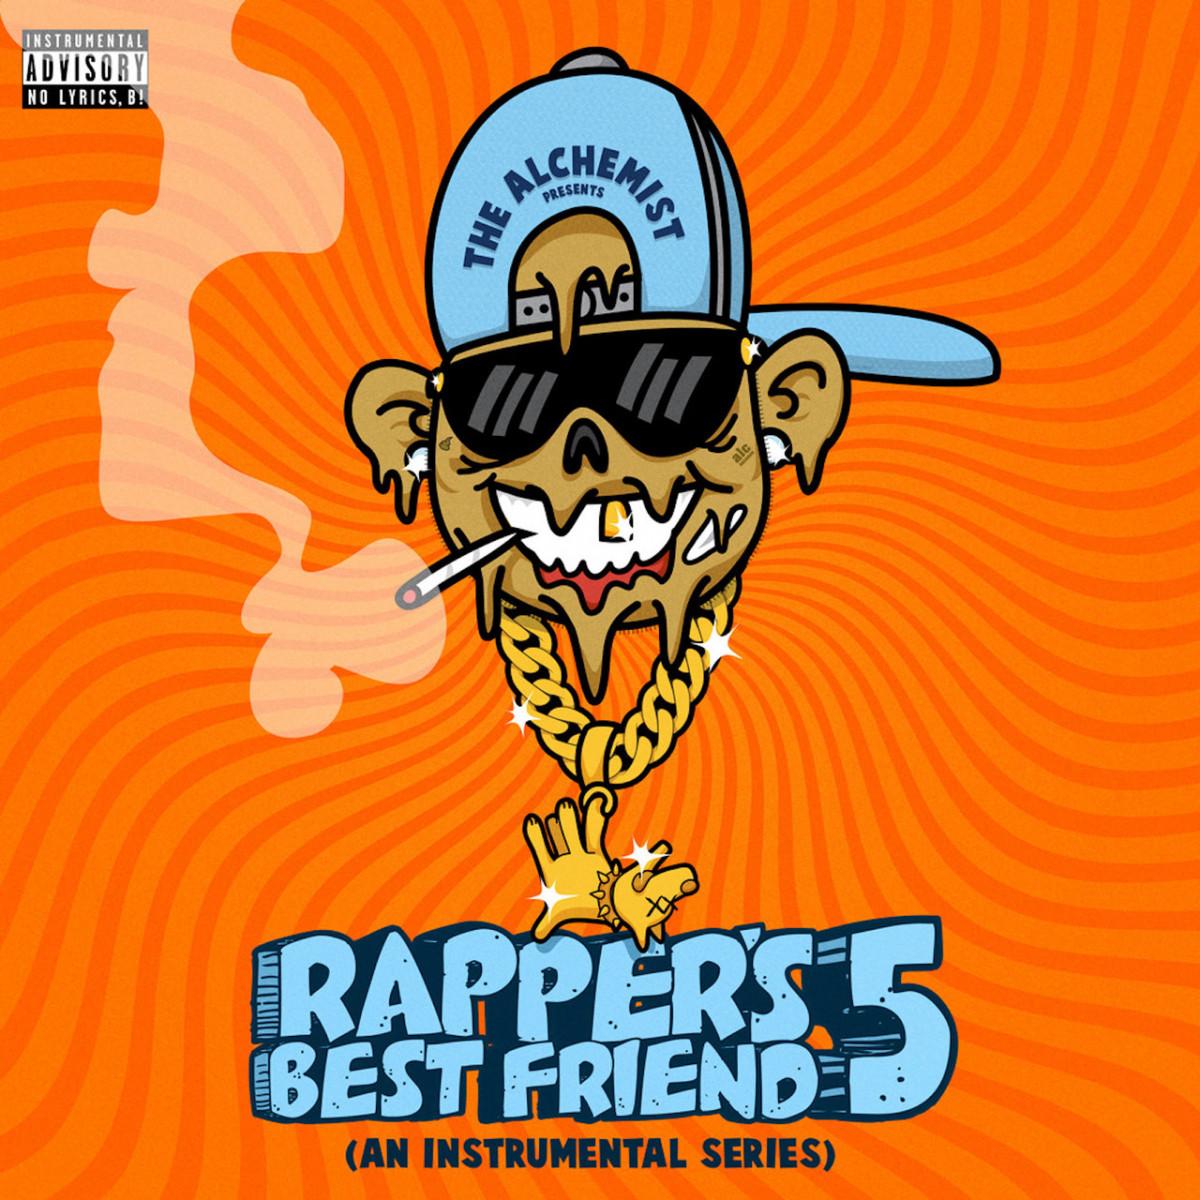 The Alchemist — «Rapper's Best Friend 5 (An Instrumental Series)»